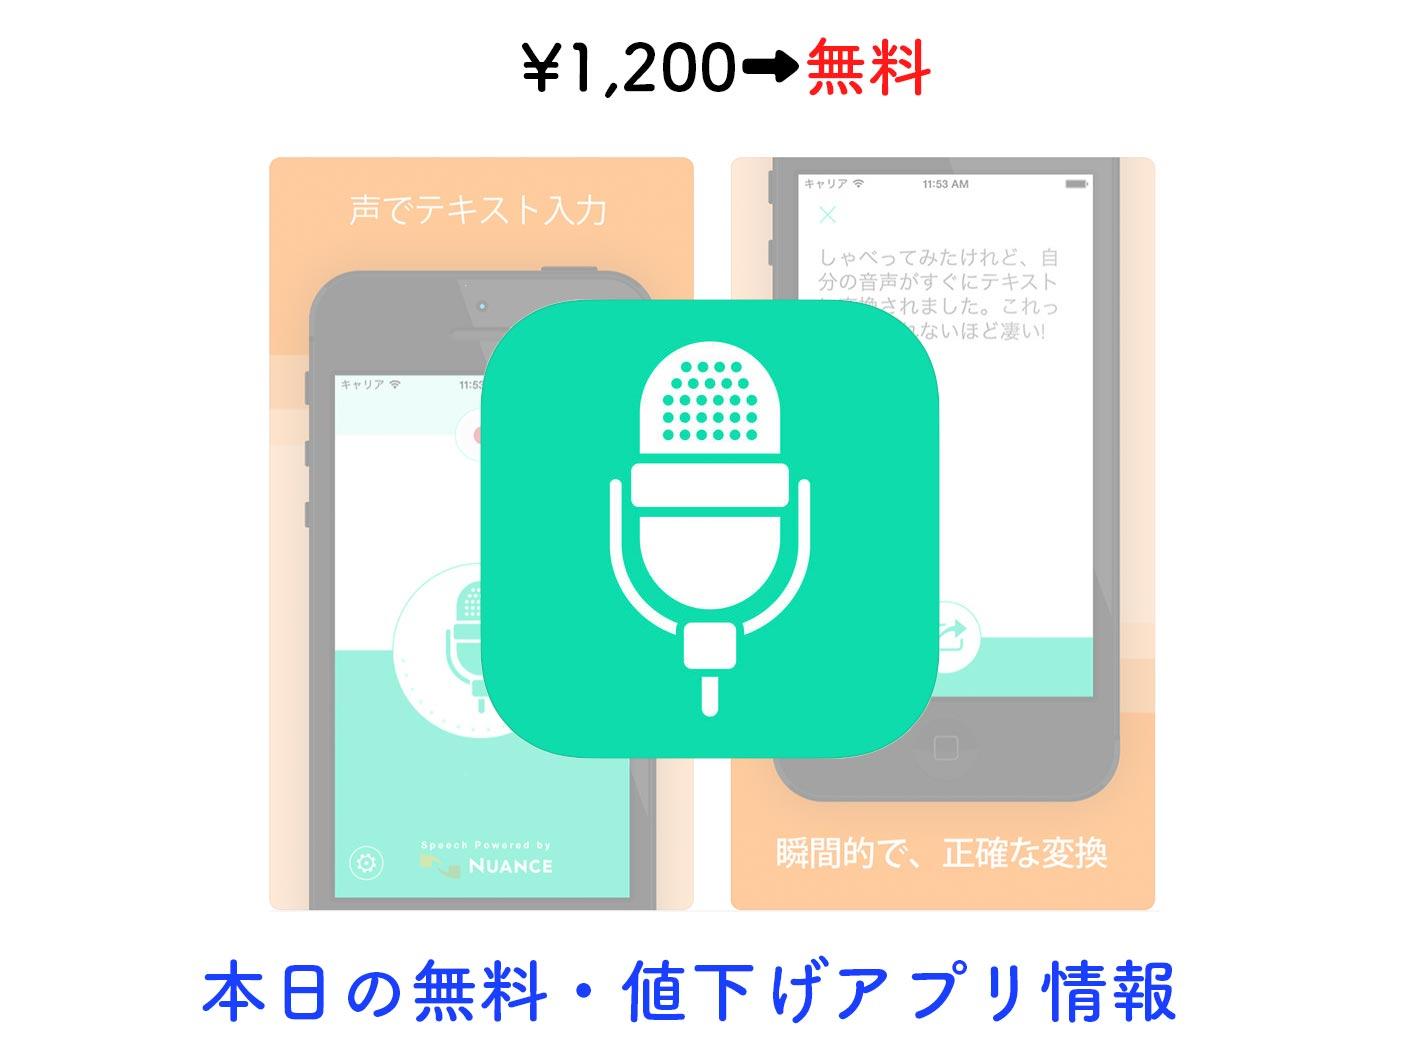 Appsale0715